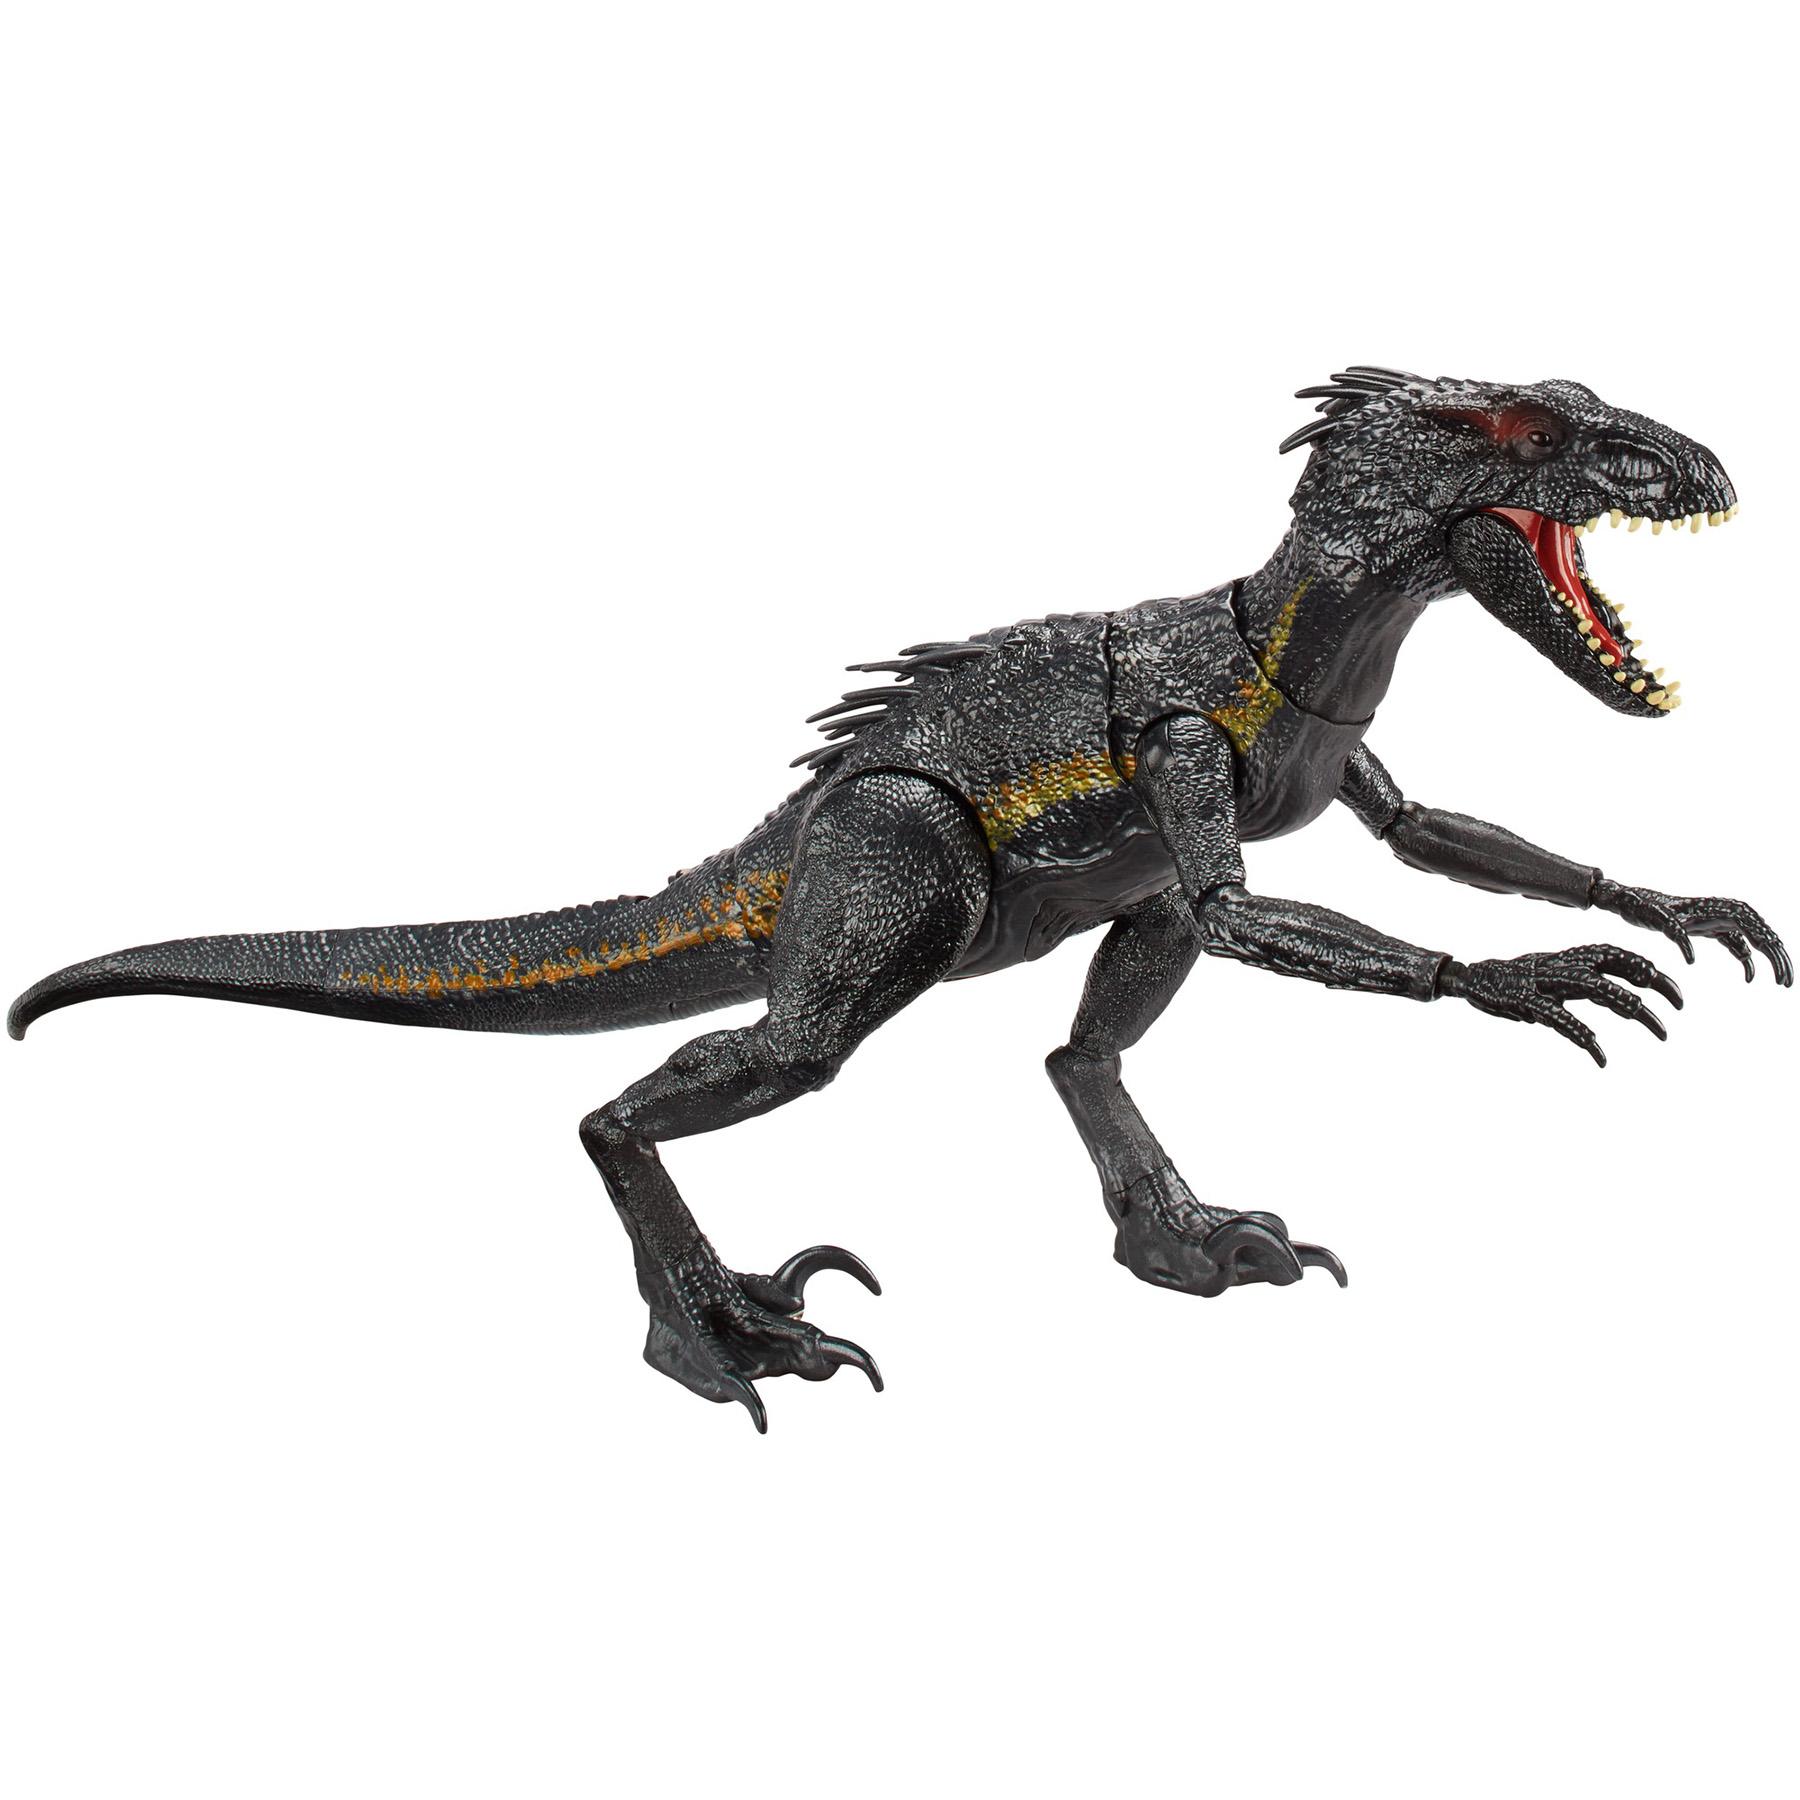 FisherPrice Jurassic World Grab 'n Growlâ ¢ Indoraptor